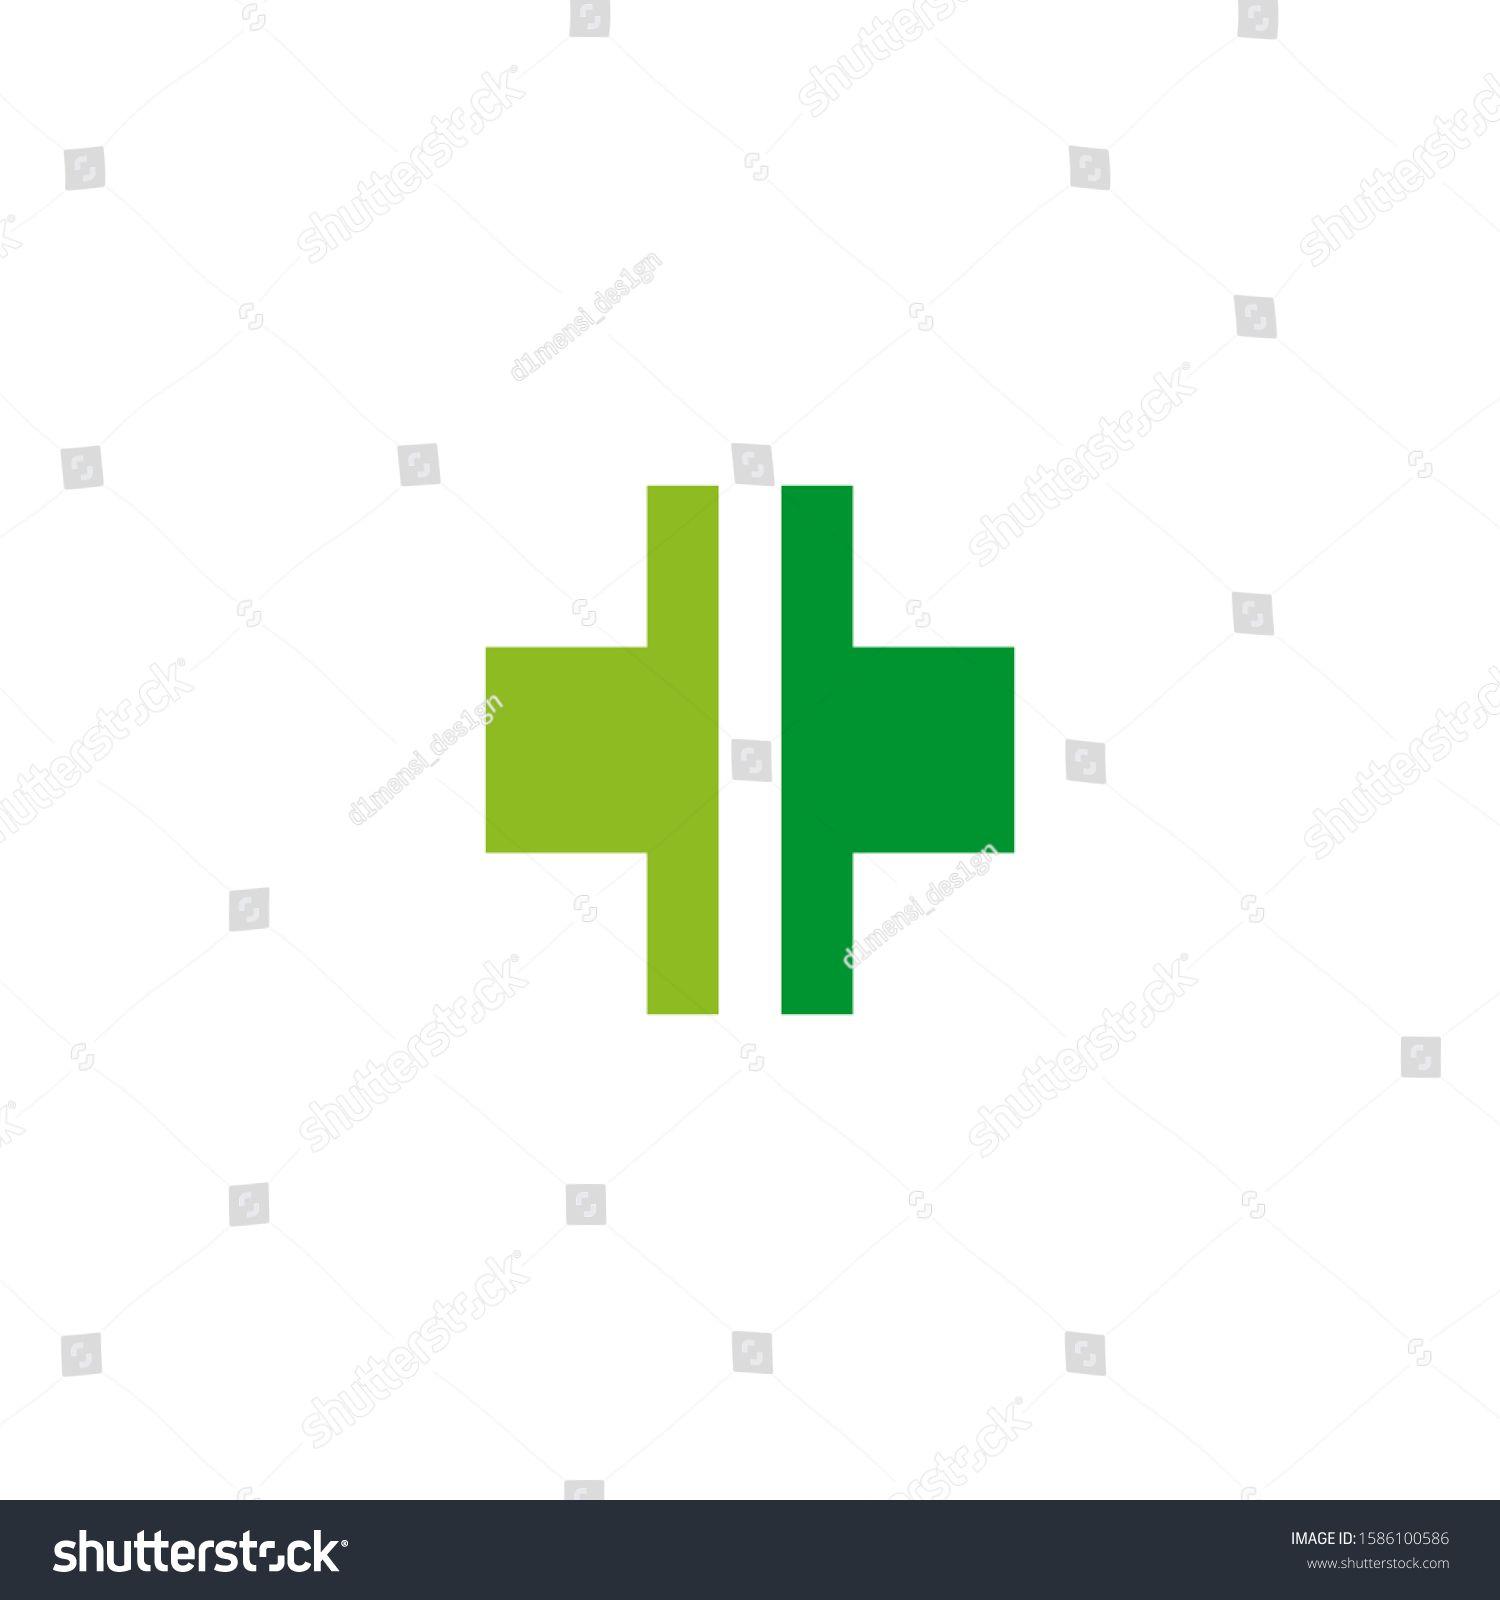 Medical and health care icon logo design vector